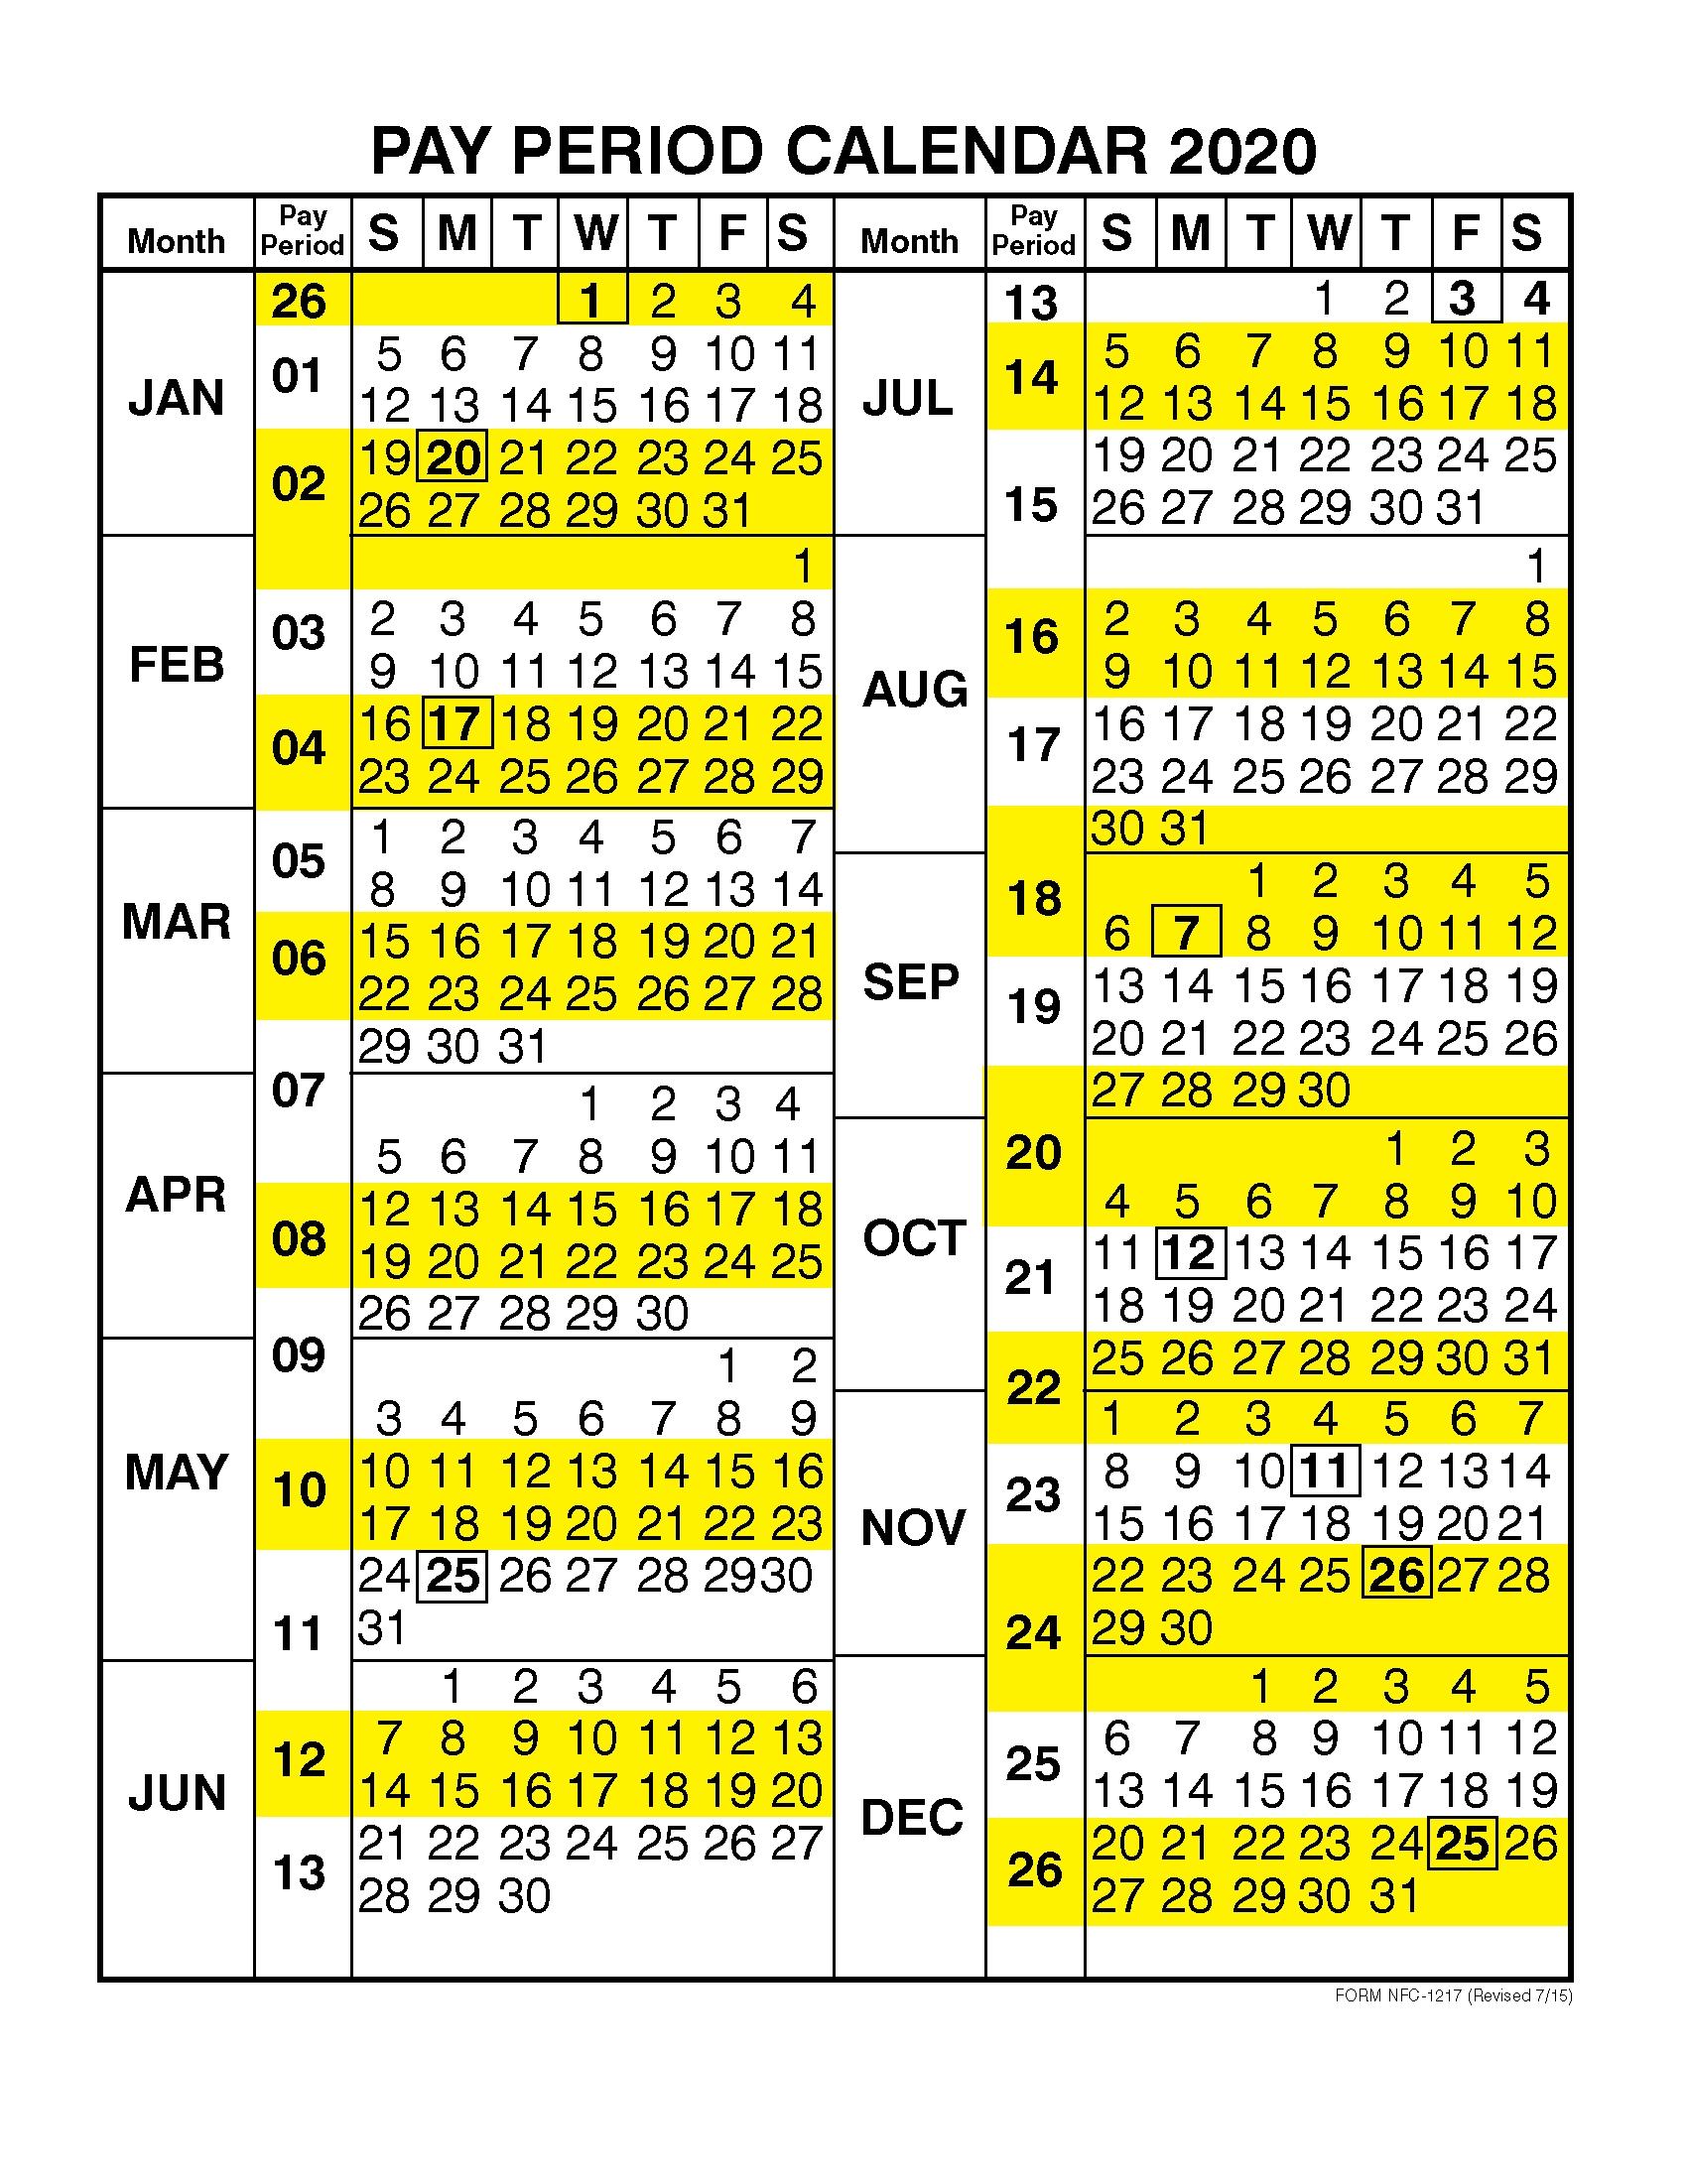 Ctu Payroll Calendar 2021 | 2021 Pay Periods Calendar